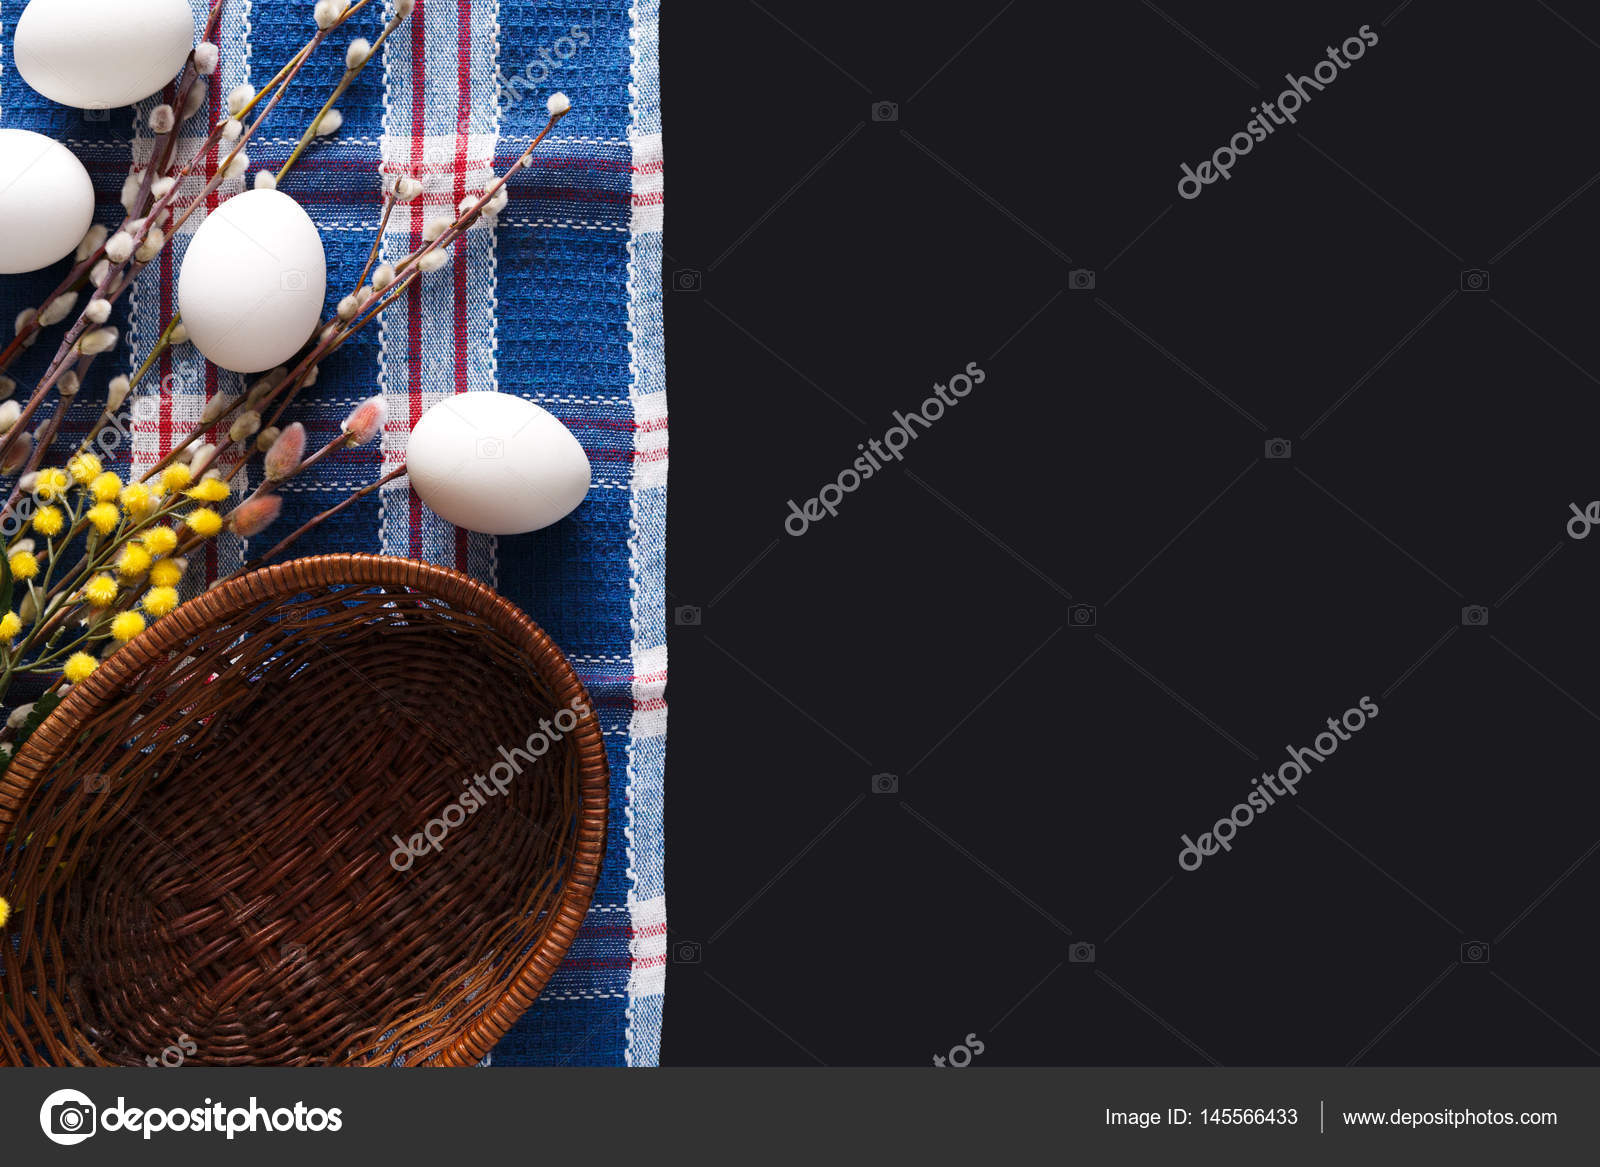 Paskalya Mockup Boyama Siyah Arka Plan üzerine Beyaz Yumurta Stok